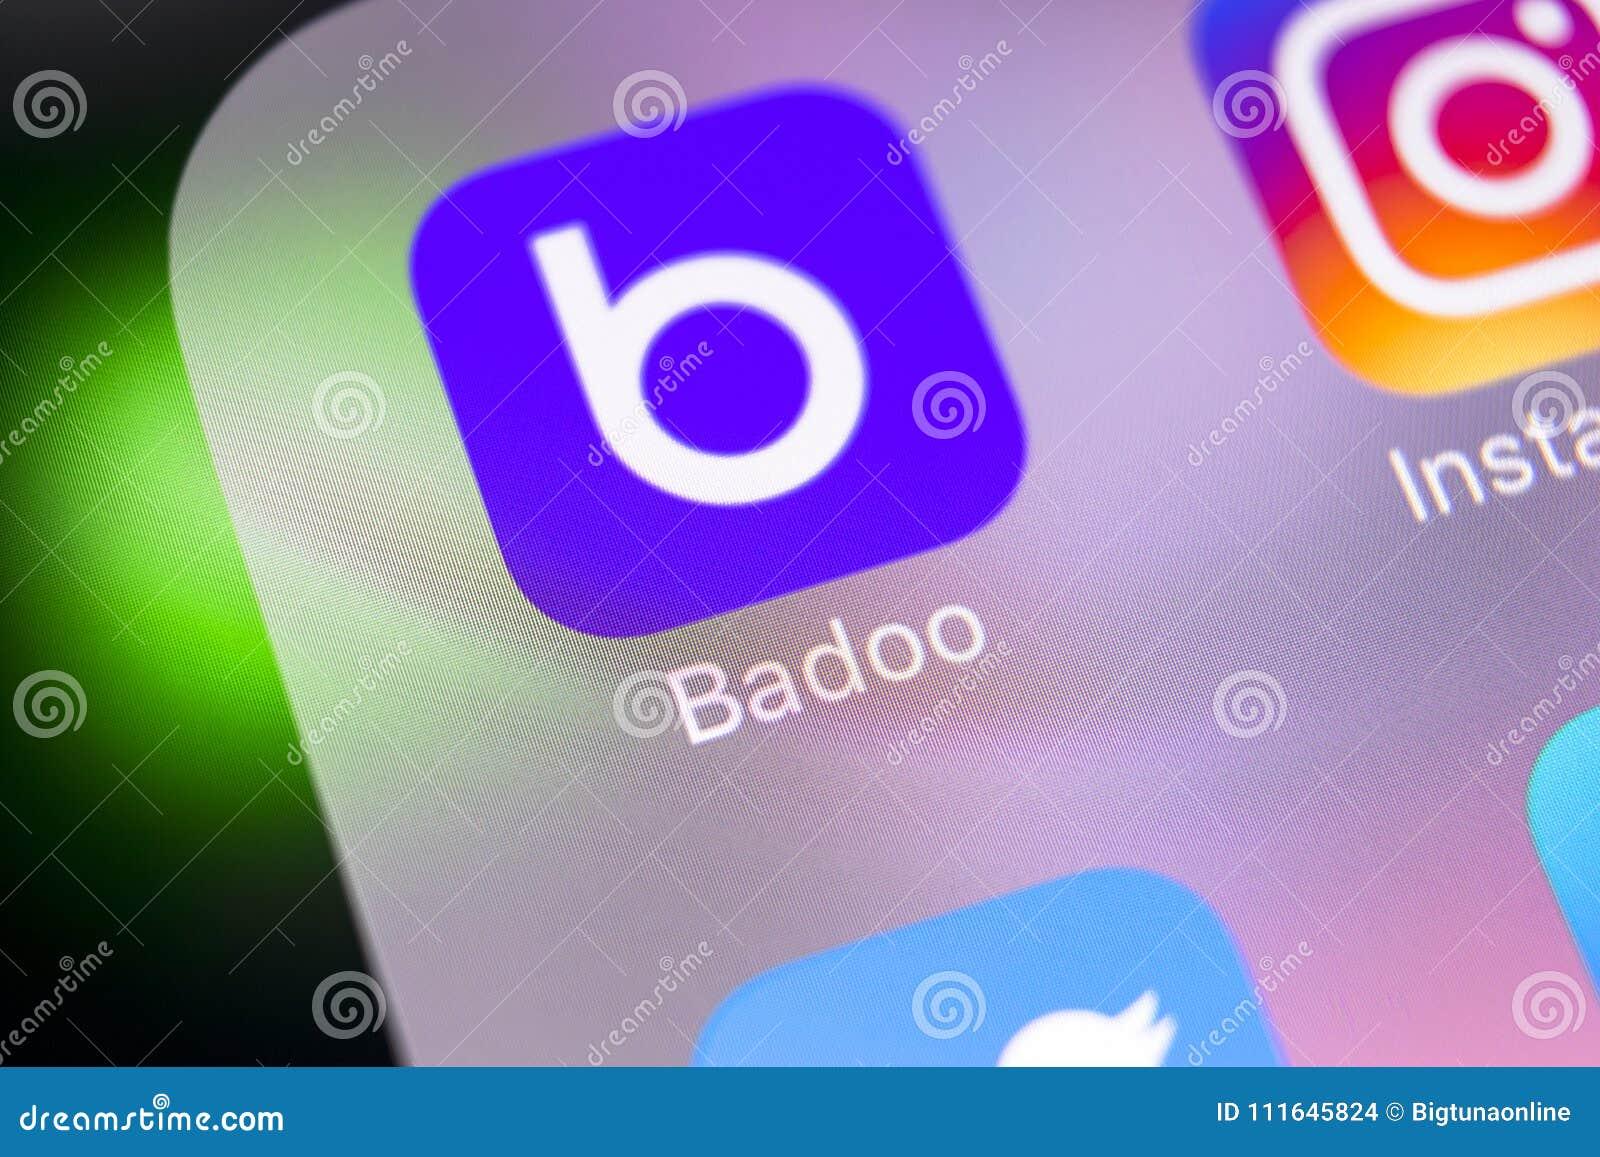 Badoo To download